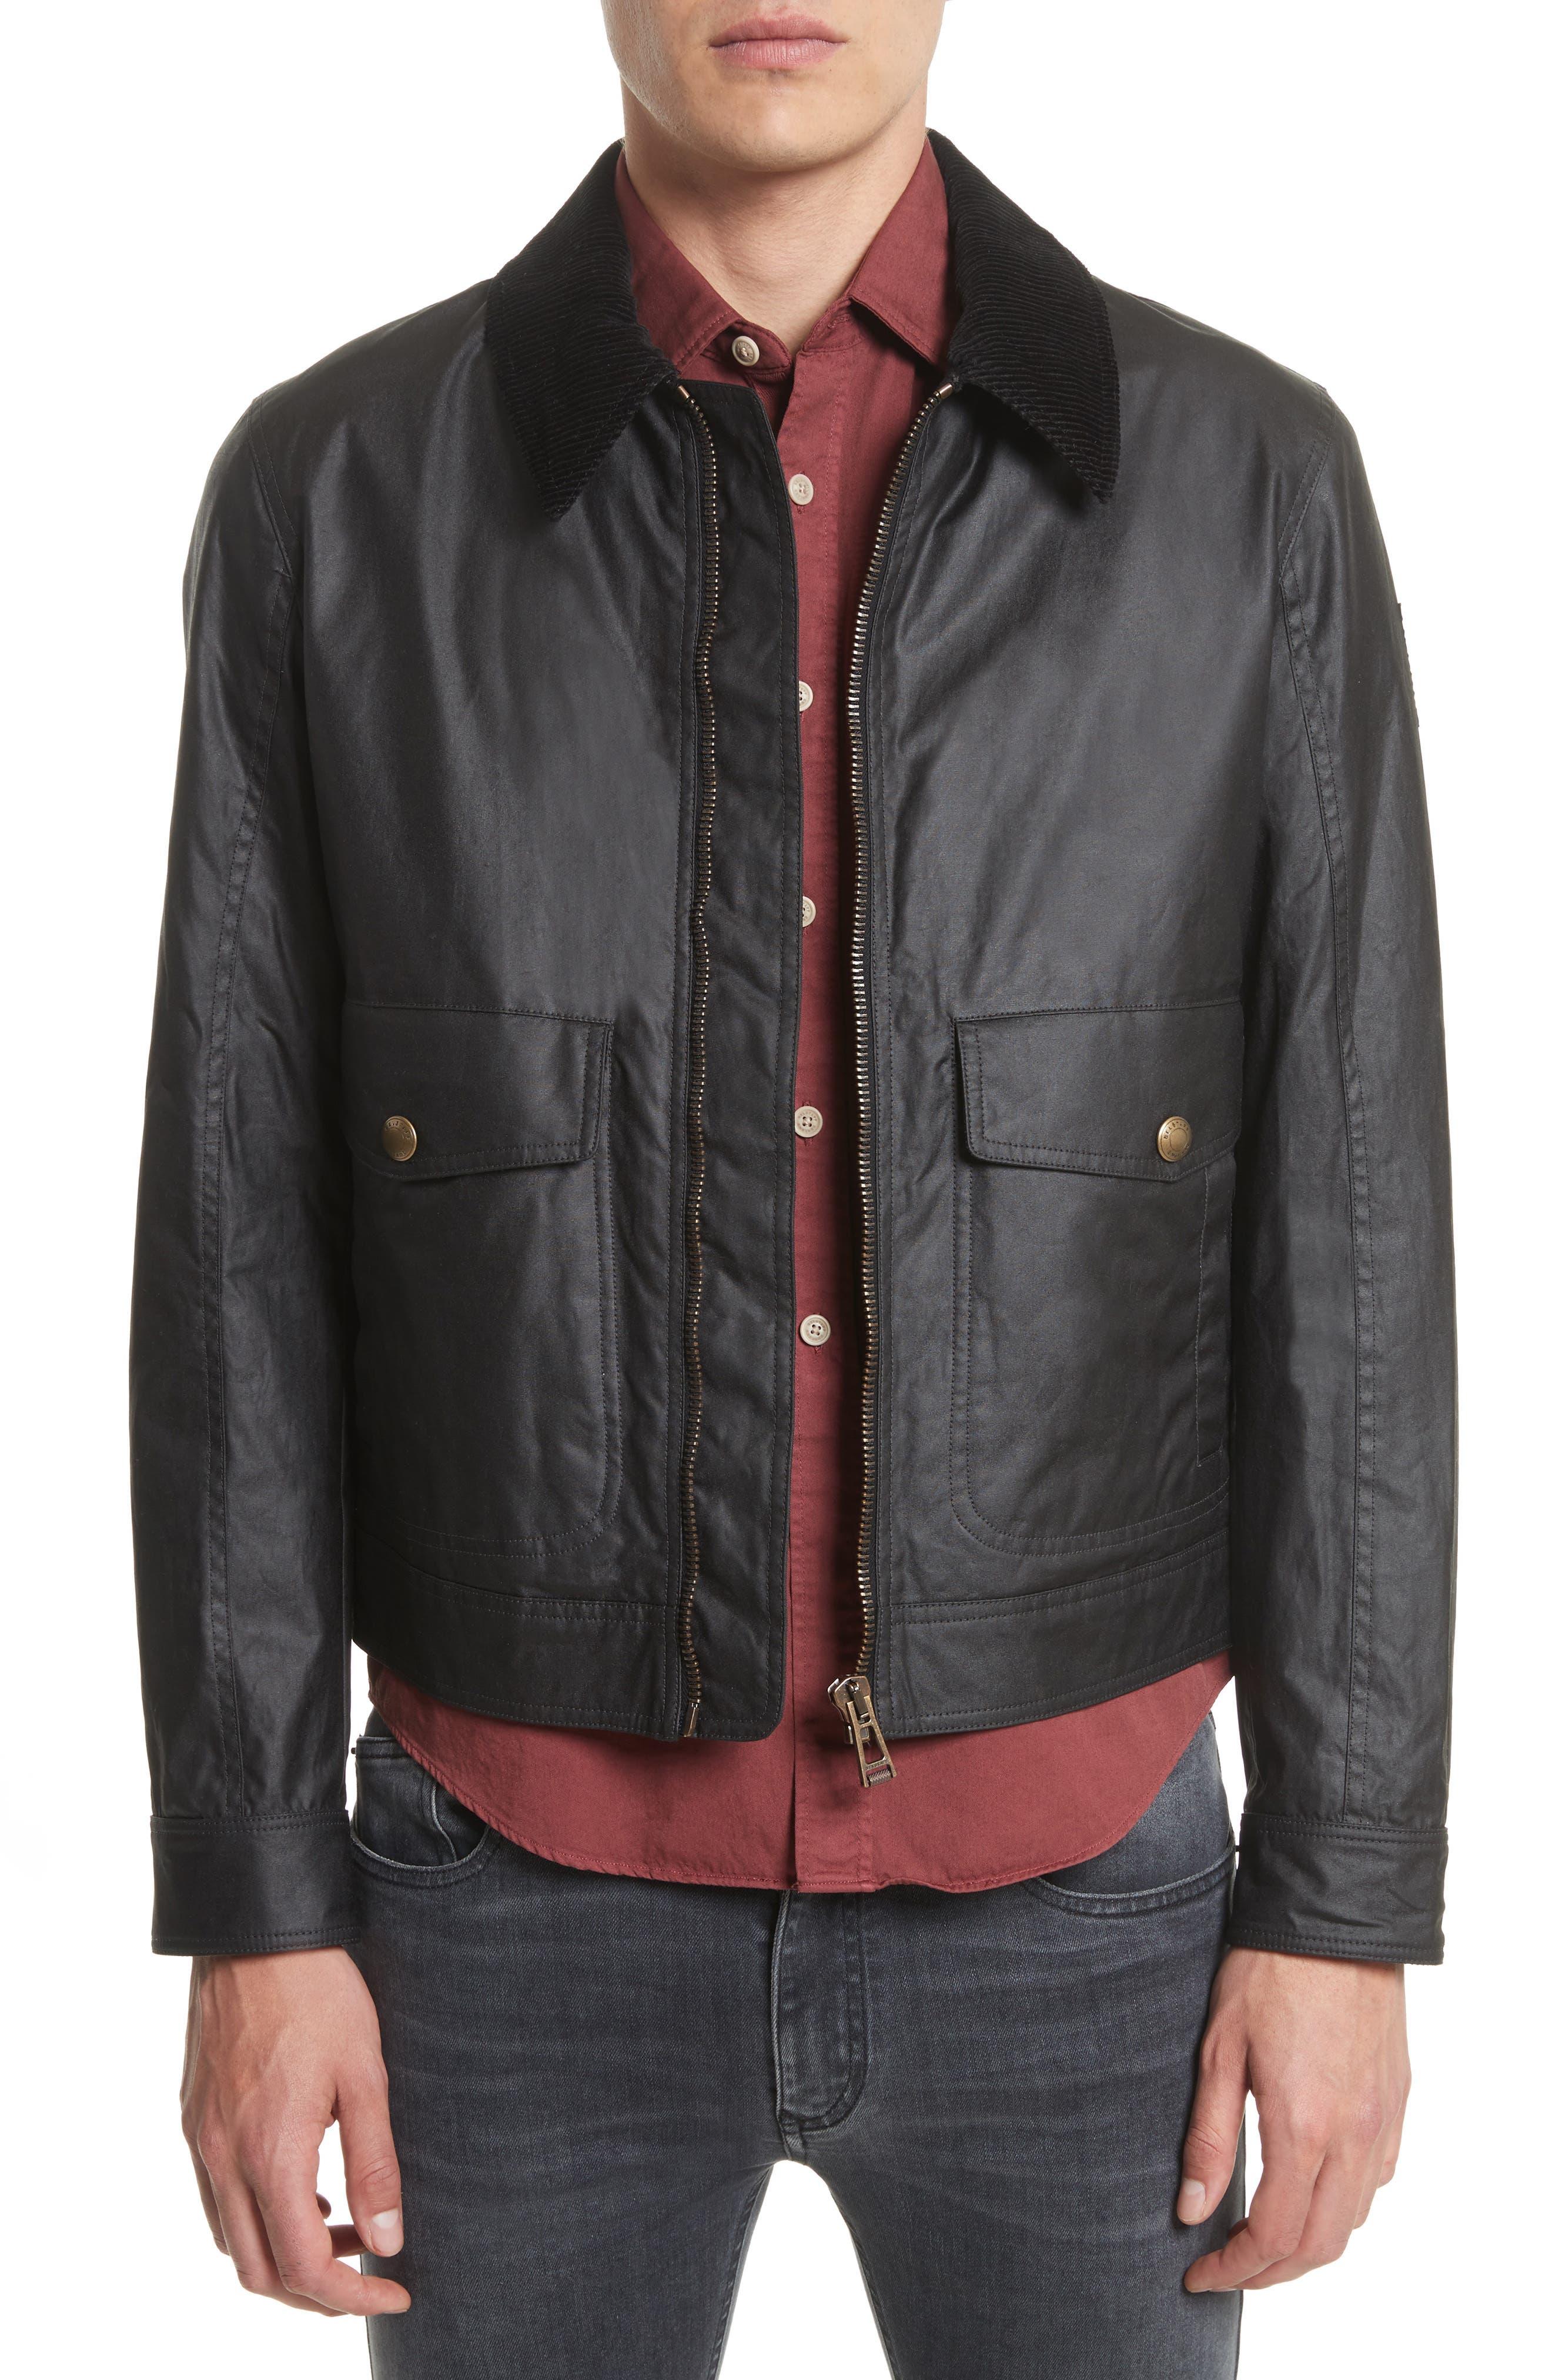 Main Image - Belstaff Mentmore Waxed Cotton Jacket